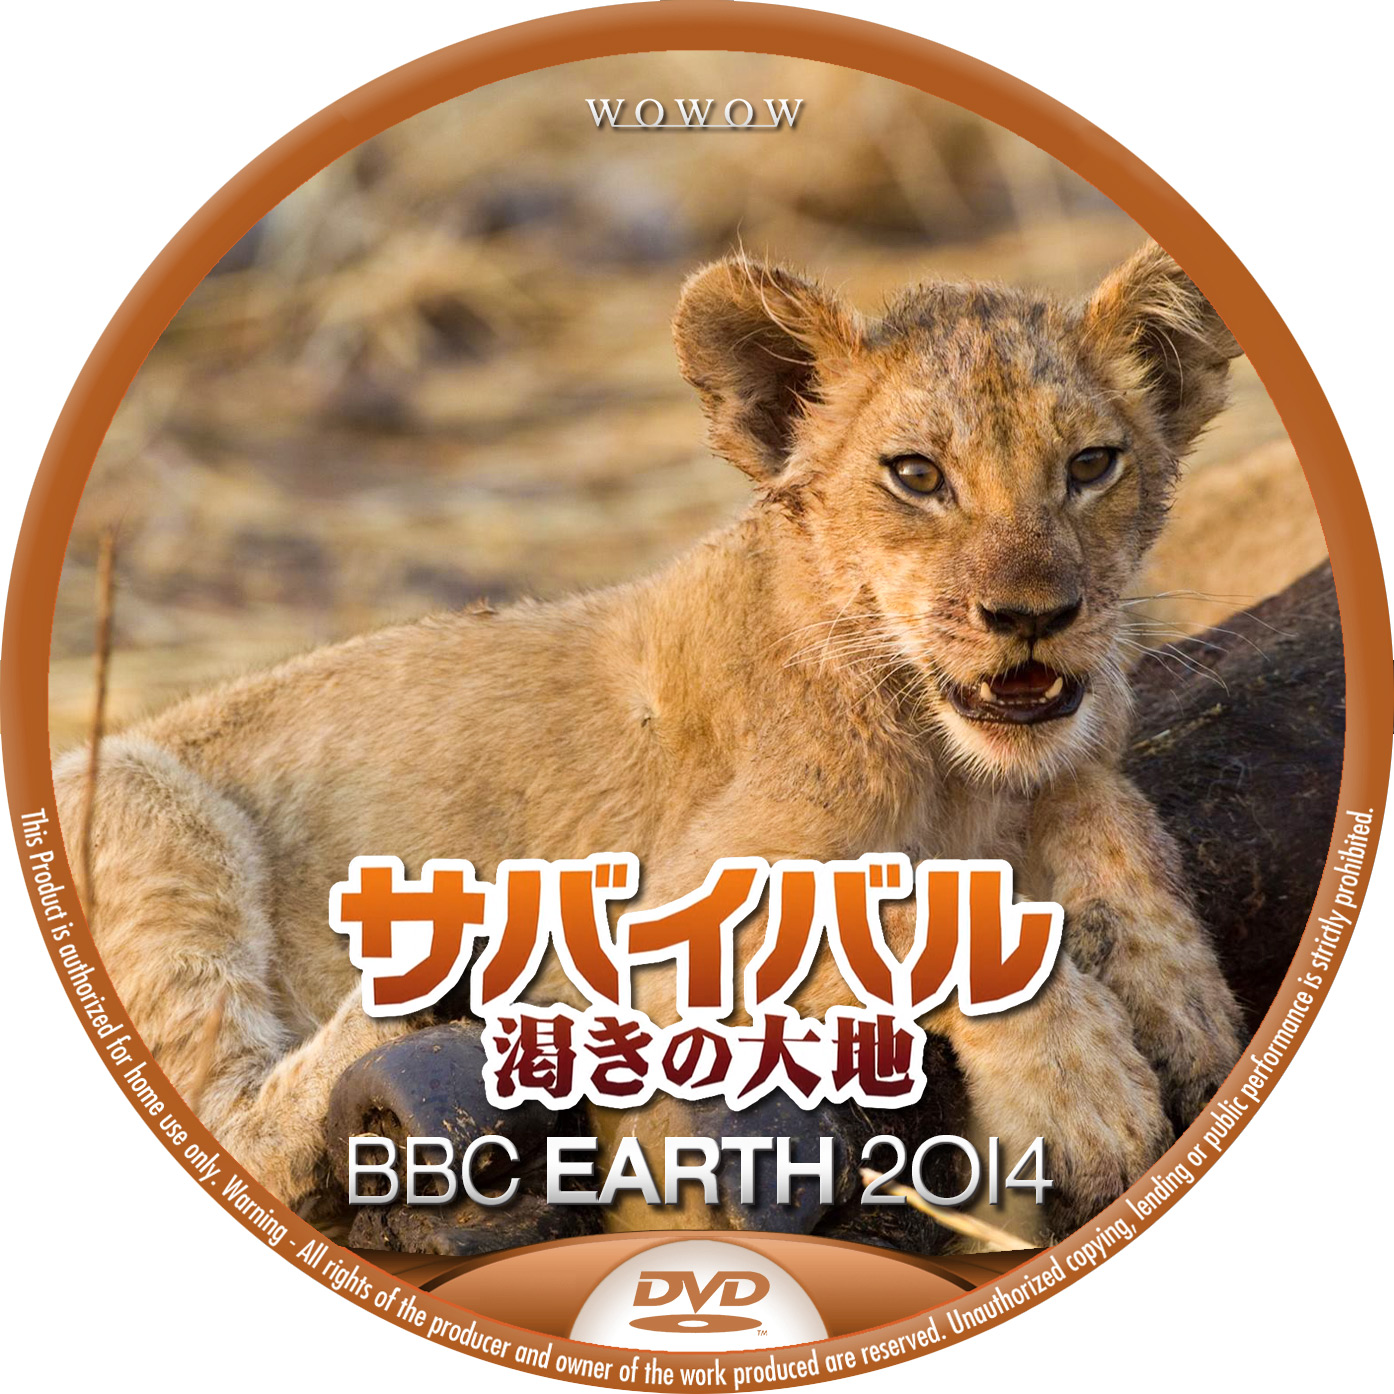 BBC EARTH 2014 渇きの大地 WOWOW DVDラベル